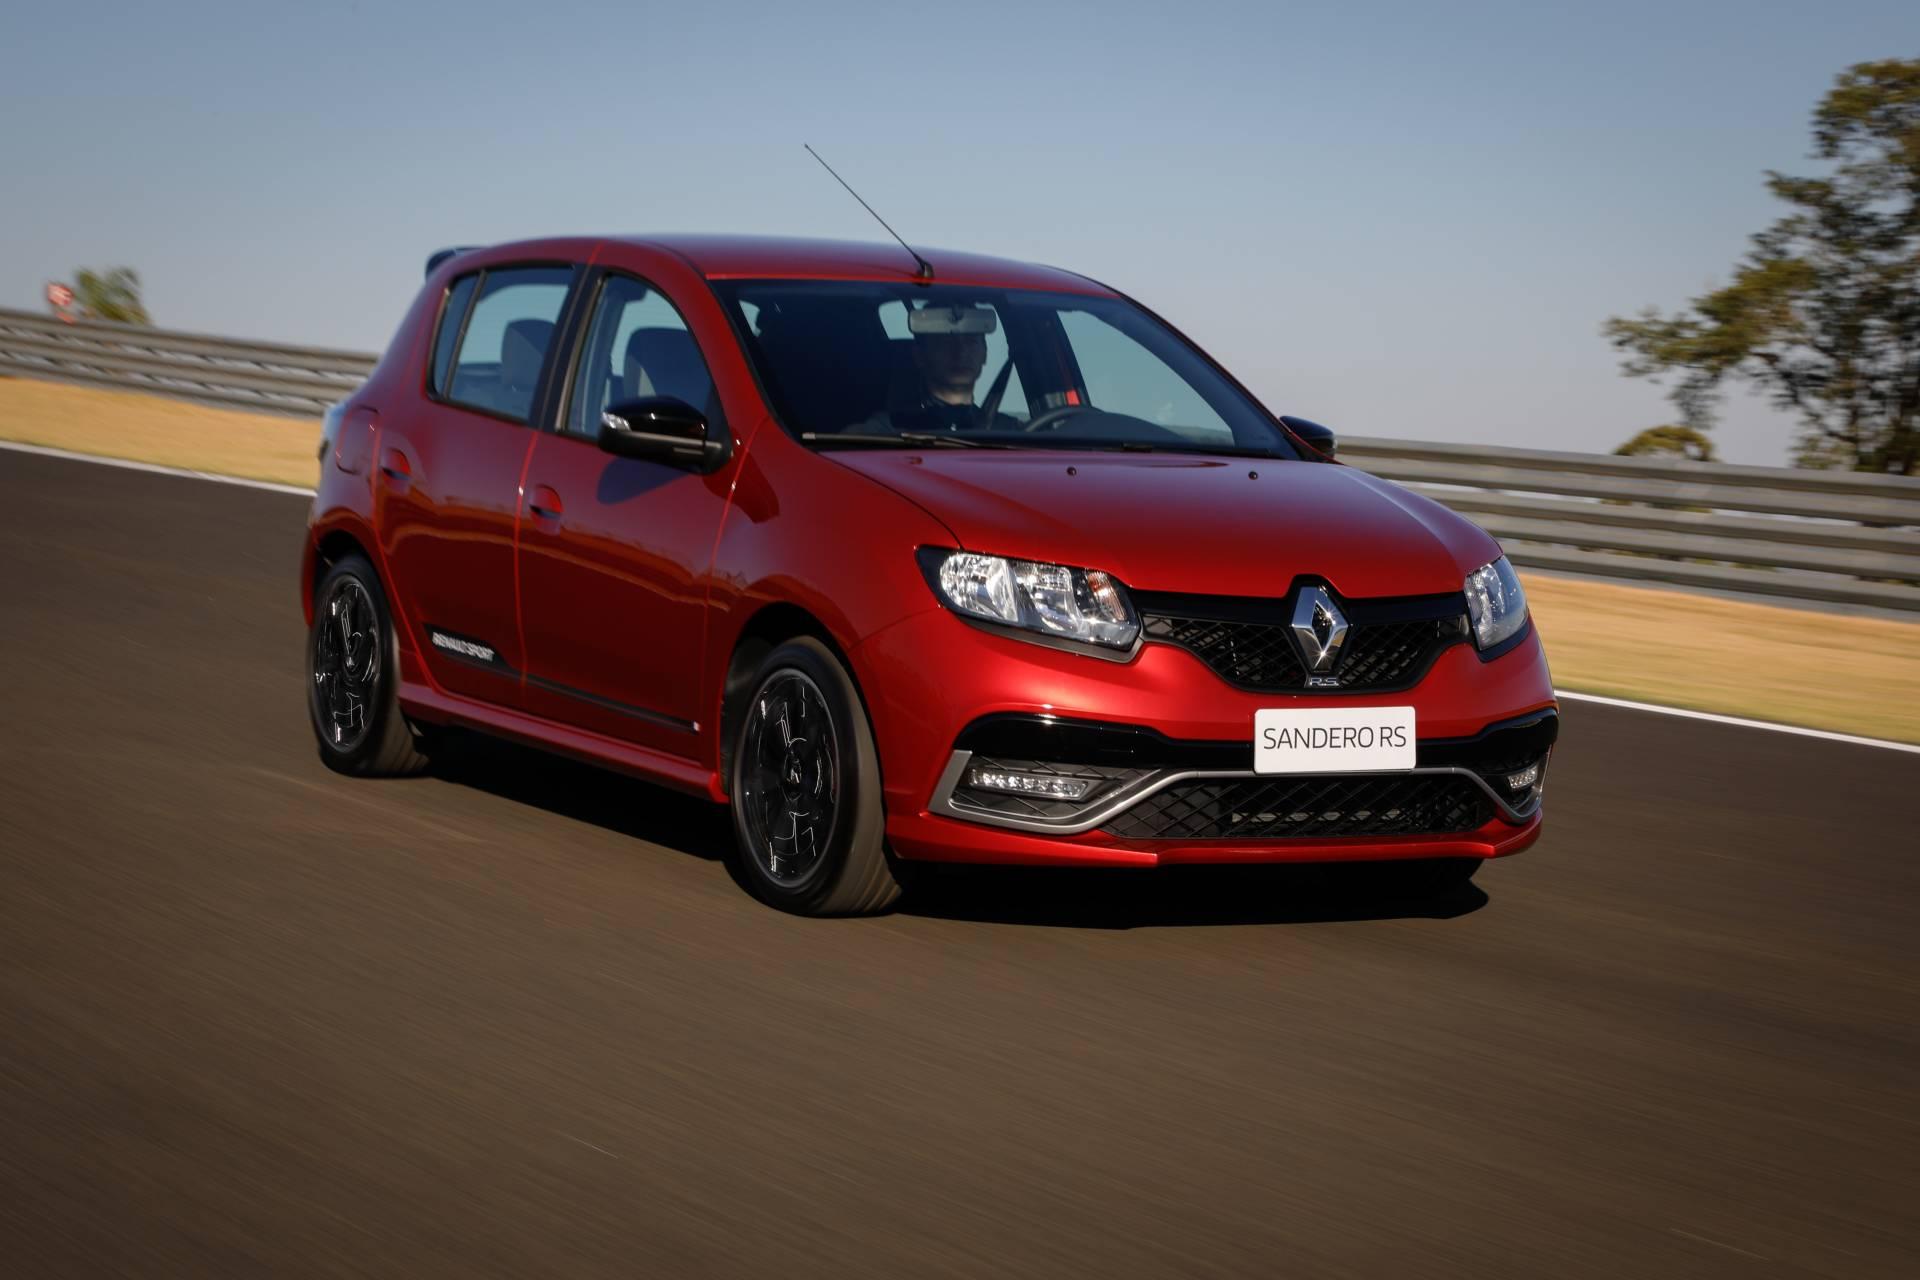 2020_Renault_Sandero_RS_facelift_0007